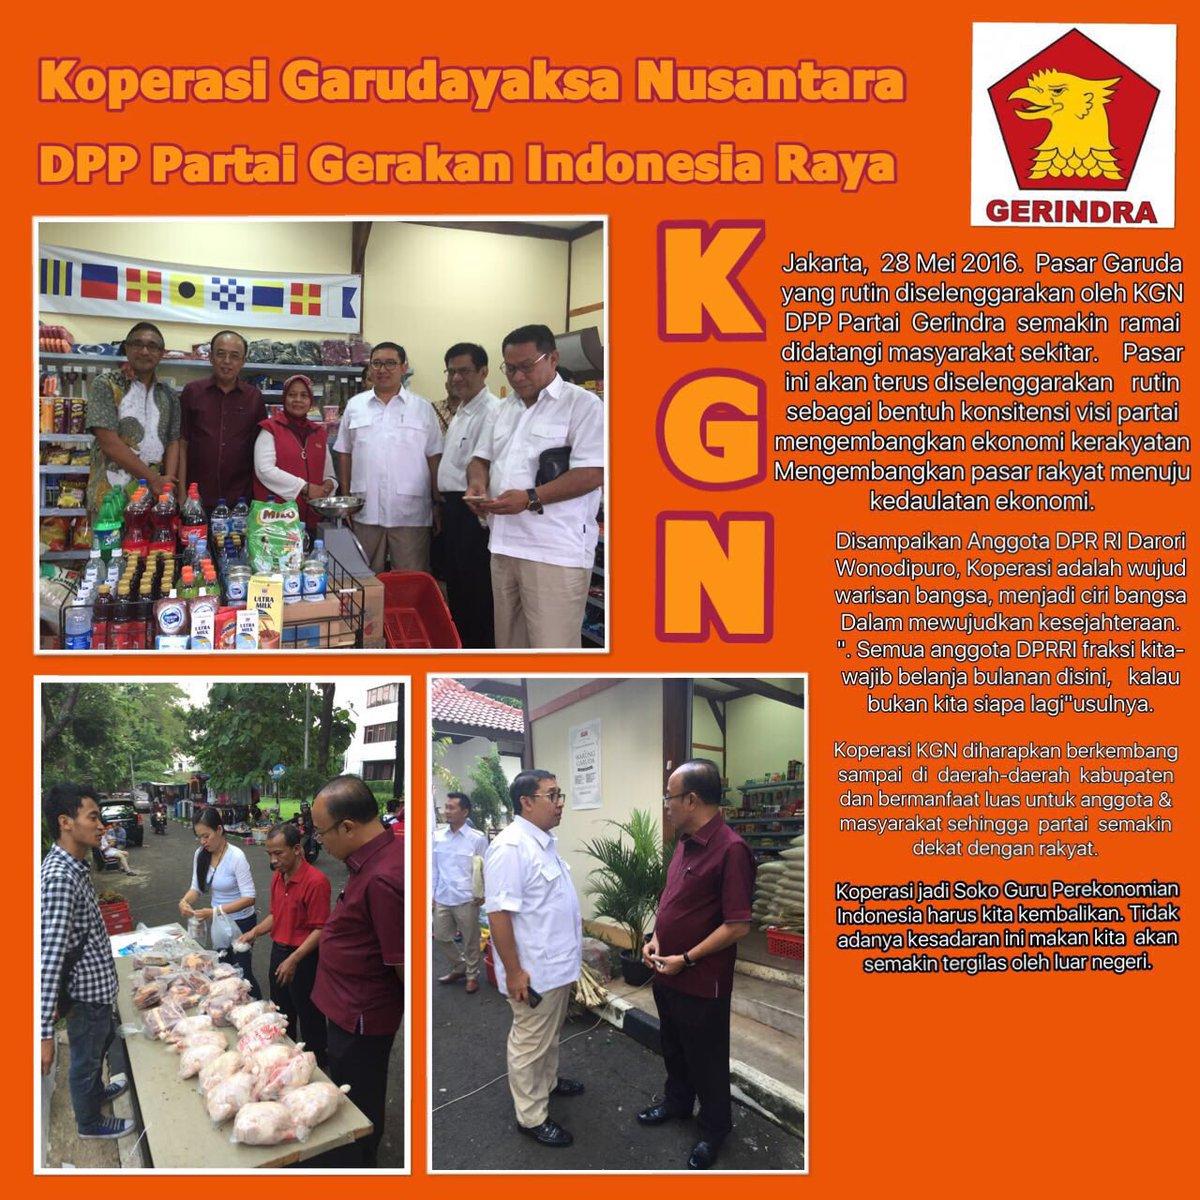 #kegiatan #anggotadprri #gerindra #gerindraindonesia #darori #wonodipuropic.twitter.com/DXi3stskoL